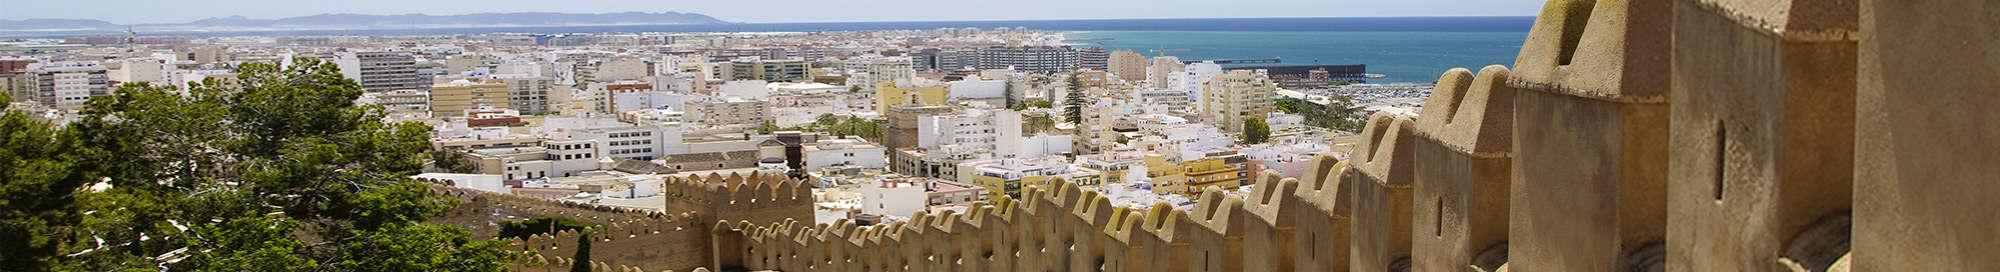 Week end e soggiorni Almería